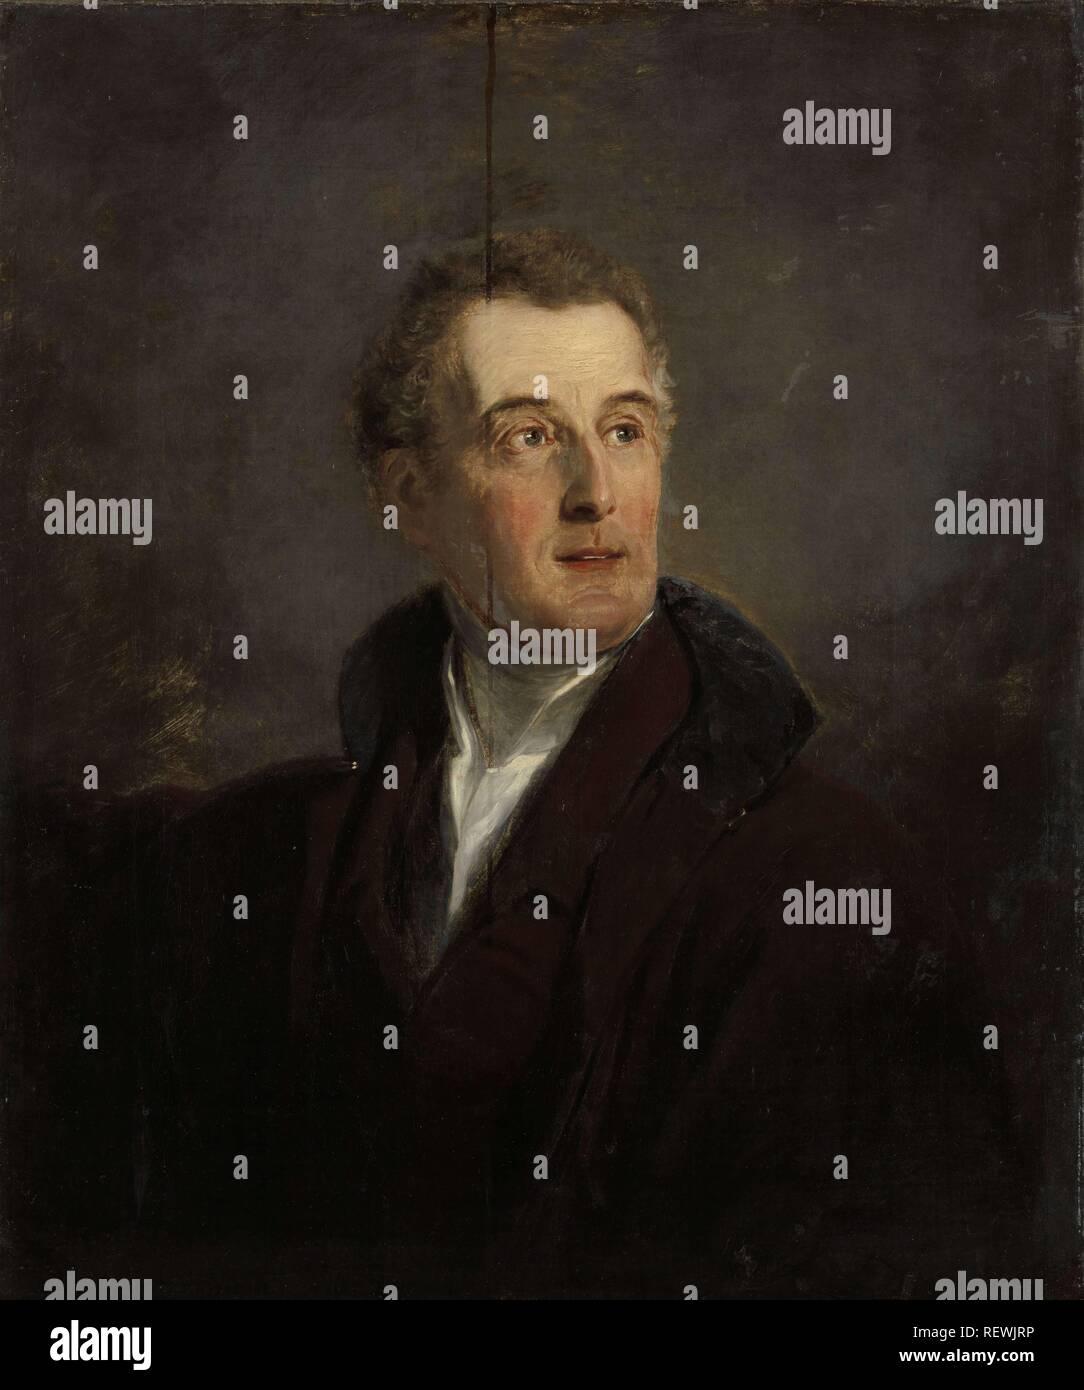 Portrait Study of Arthur Wellesley, Duke of Wellington. Portrait of Arthur Wellesley, Duke of Wellington (1769-1852). Dating: 1821. Place: London. Measurements: h 76 cm × w 63.5 cm; d 12 cm. Museum: Rijksmuseum, Amsterdam. Author: Jan Willem Pieneman (mentioned on object). - Stock Image